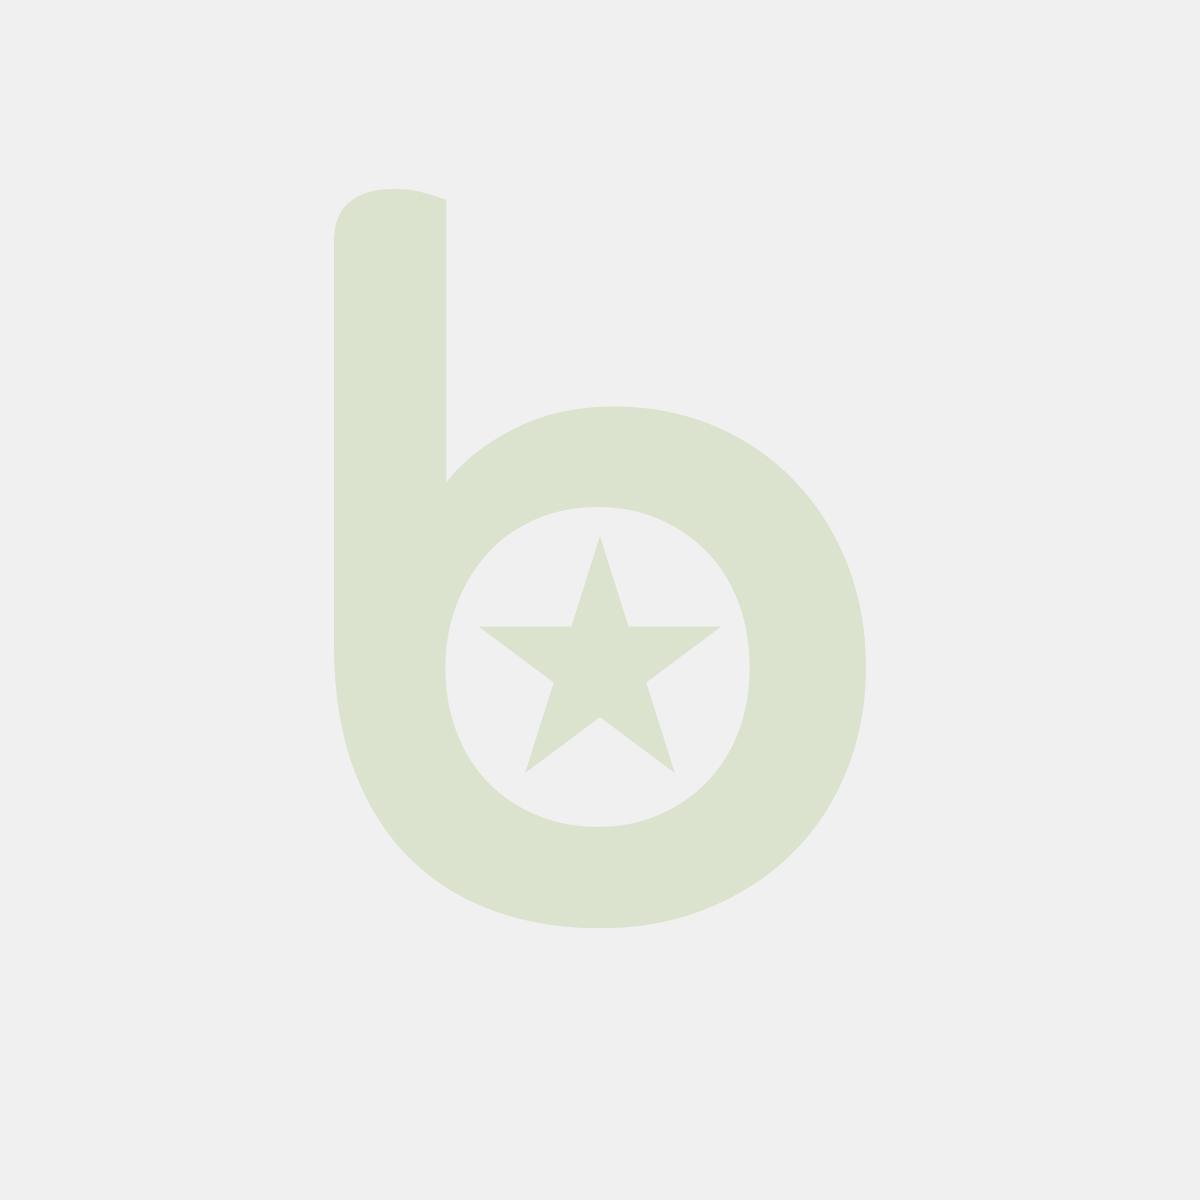 Zakładki indeksujące POST-IT® (680-8), PP, 25x43mm, 50 kart., purpurowe